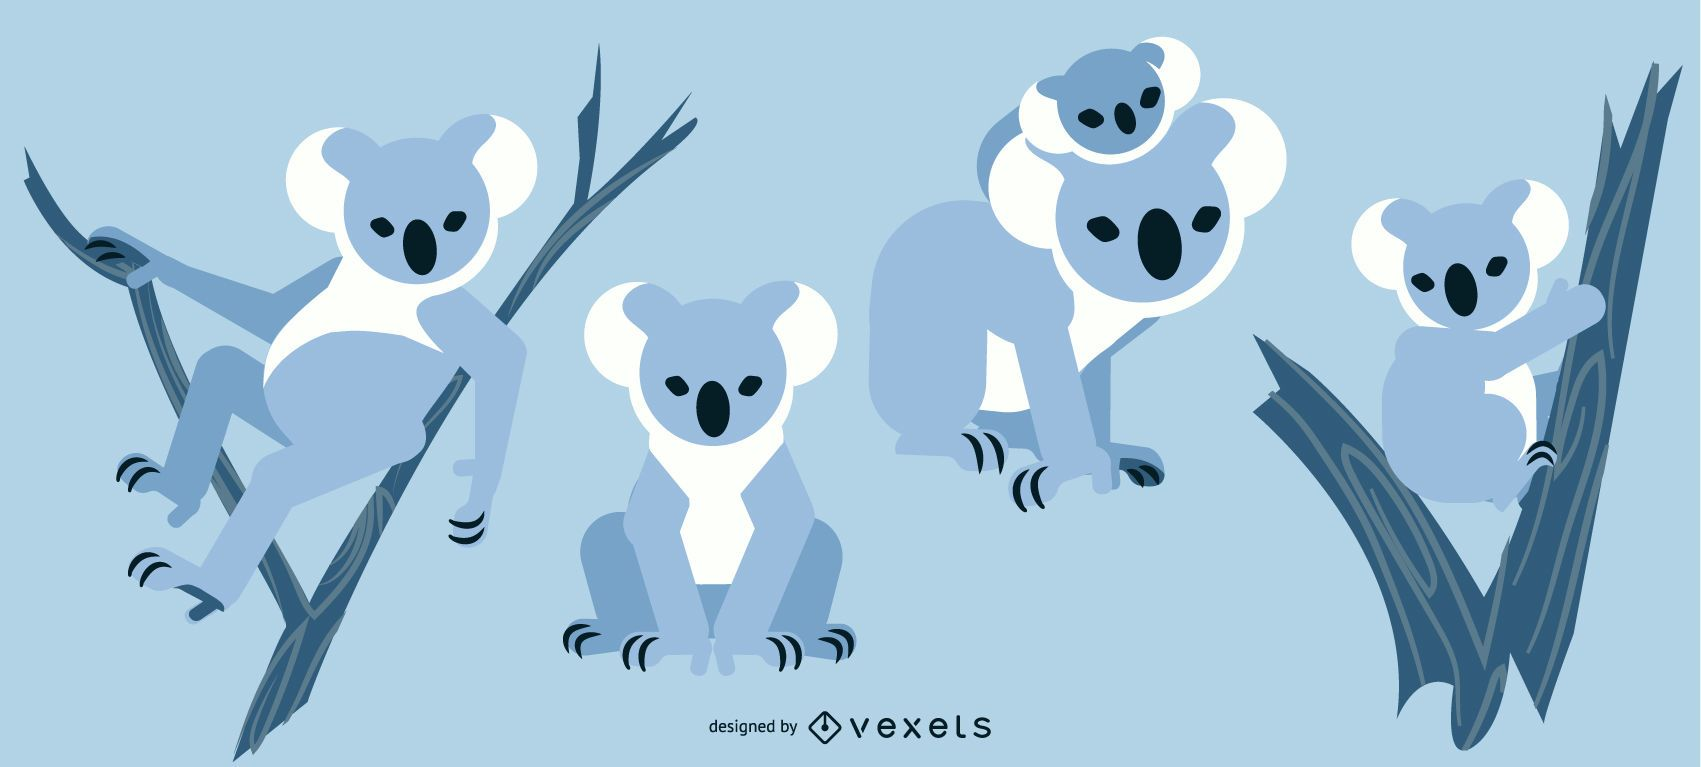 Koala Art And Design